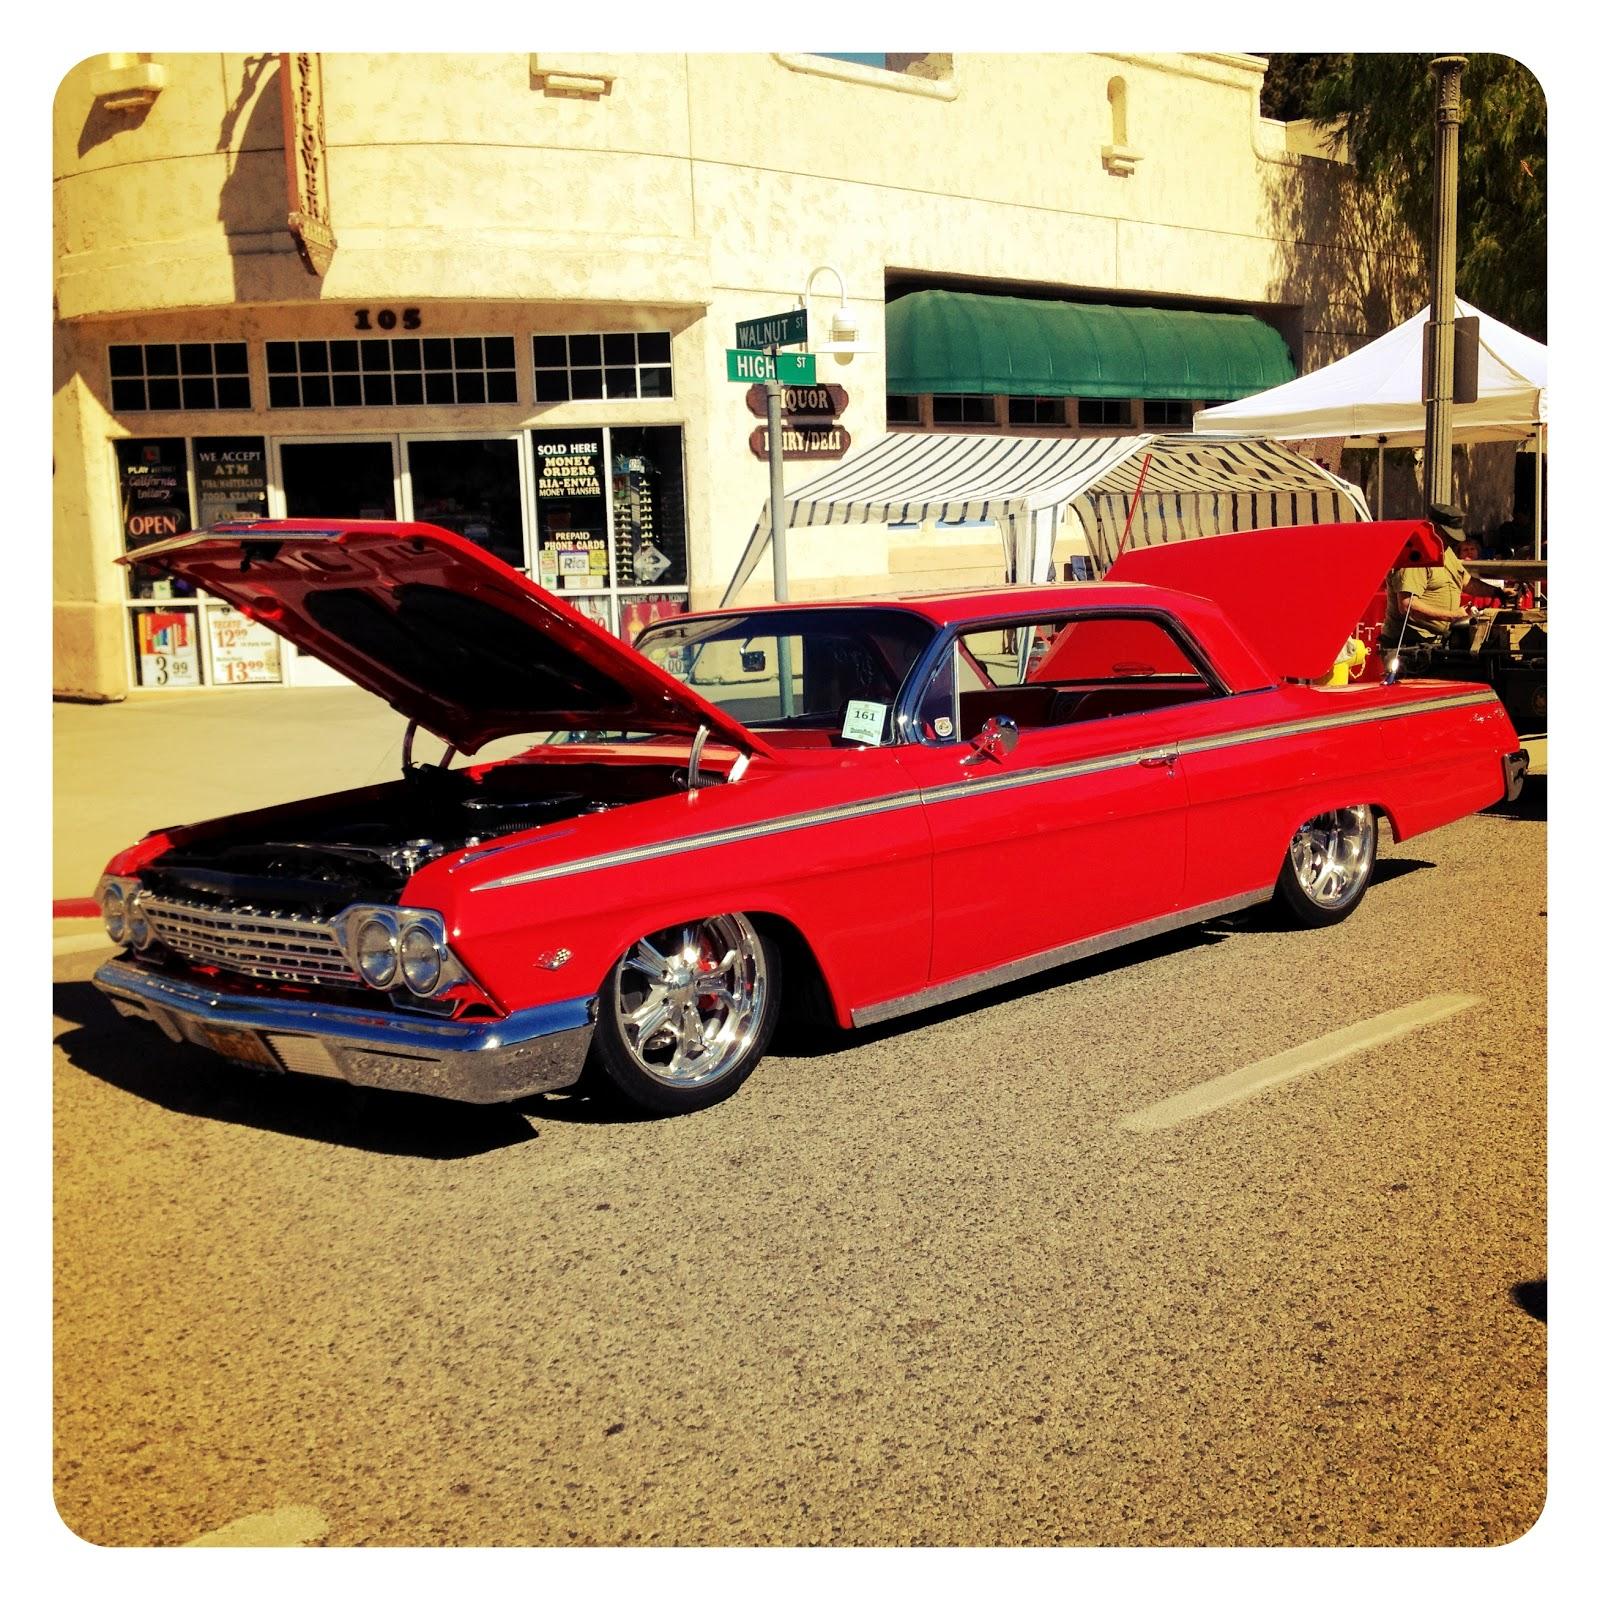 Covering Classic Cars : Roamin\' Relics Car Show in Moorpark, Ca